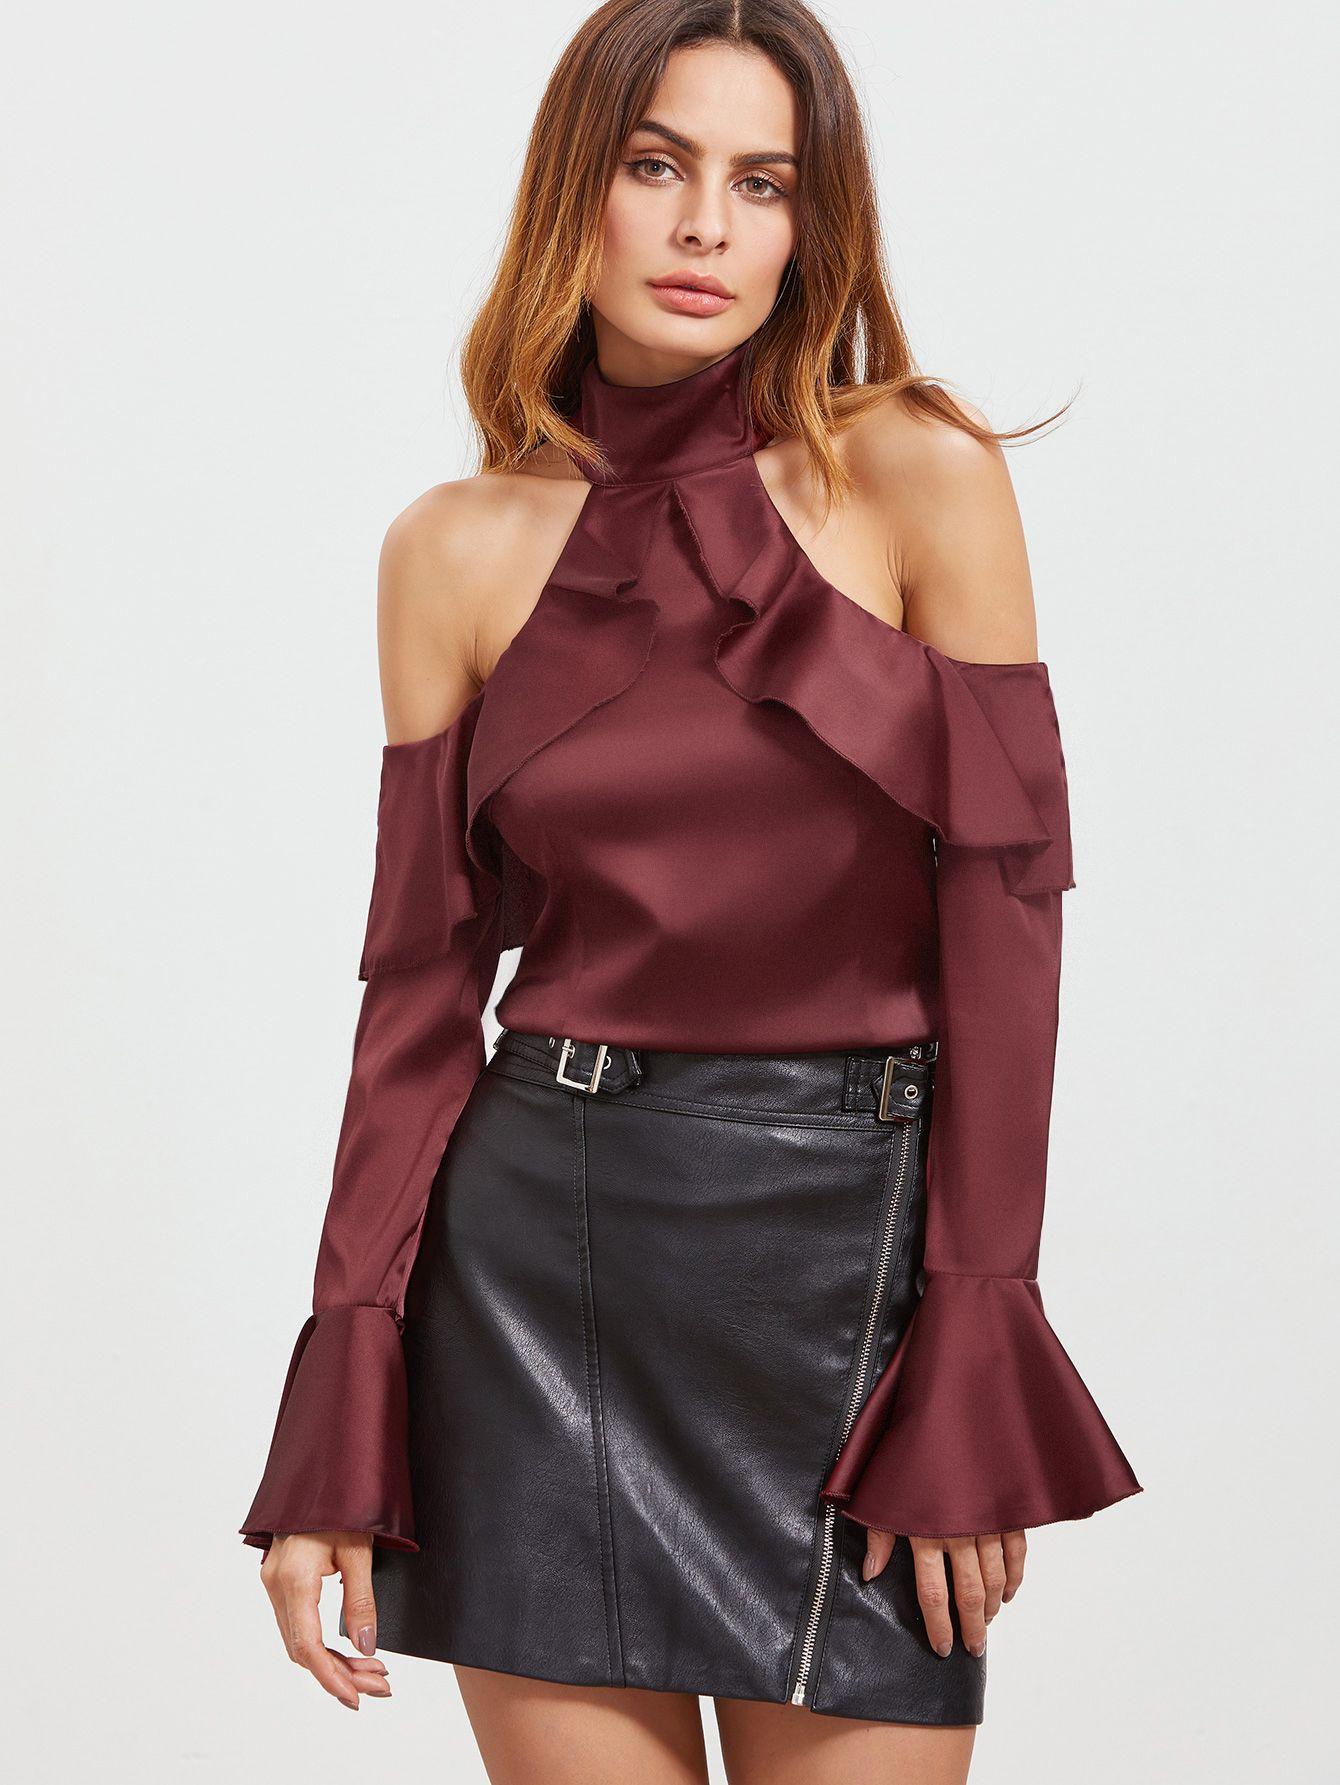 2e7f010203f887 Burgundy Cold Shoulder Bell Sleeve Zipper Back Ruffle Top -SheIn(Sheinside)